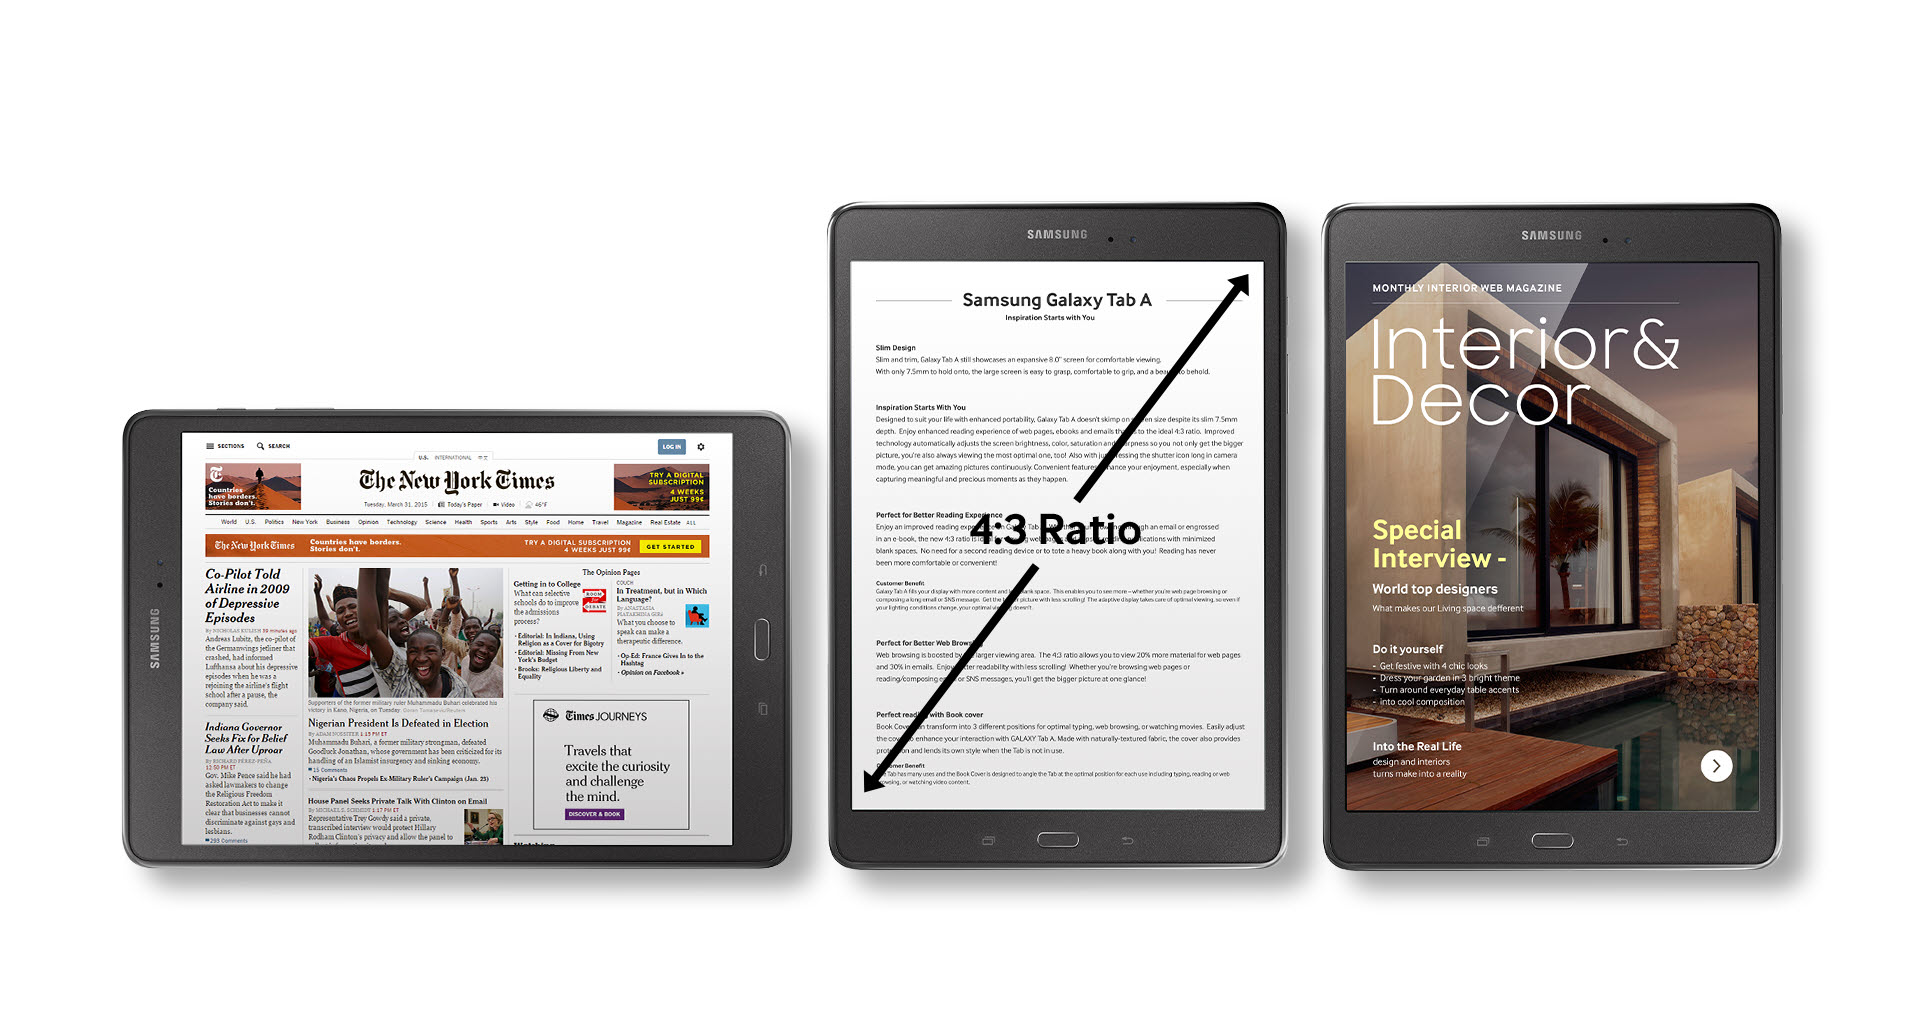 Tablet Samsung Galaxy Tab A | User manual – Devicemanuals